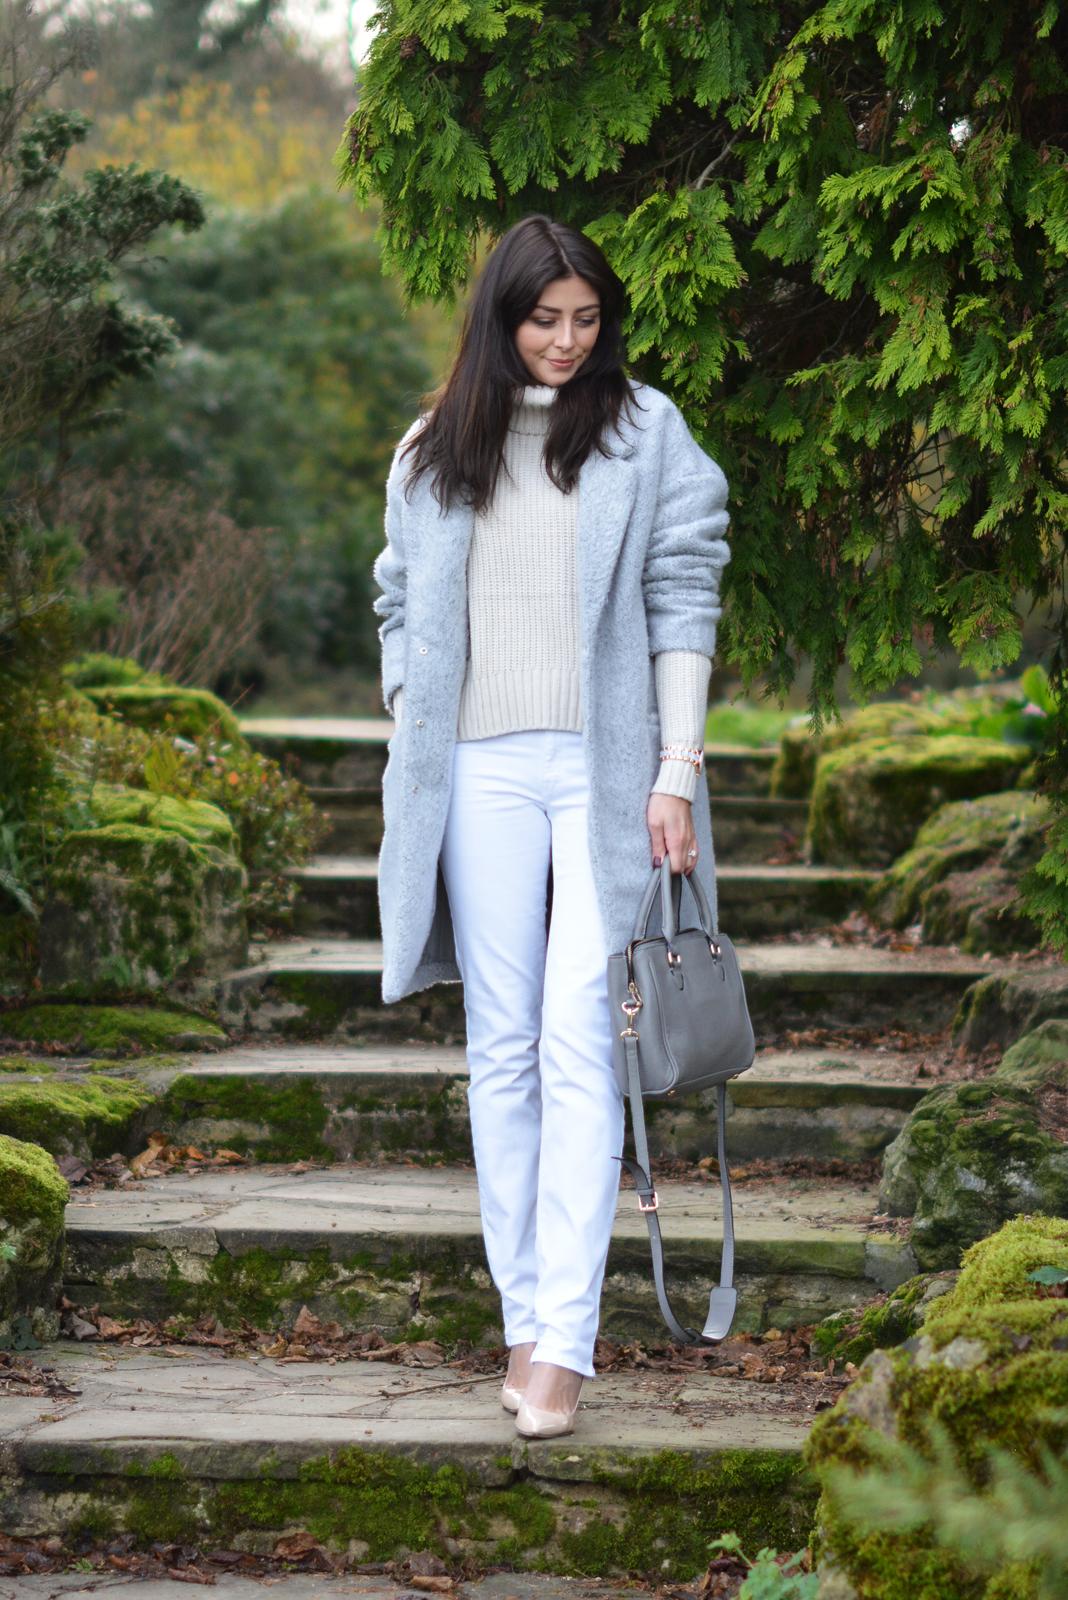 EJSTYLE - winter whites OOTD, white jeans, grey primark coat, Grey Zara city bag, Nude heels, Cream topshop jumper sweater